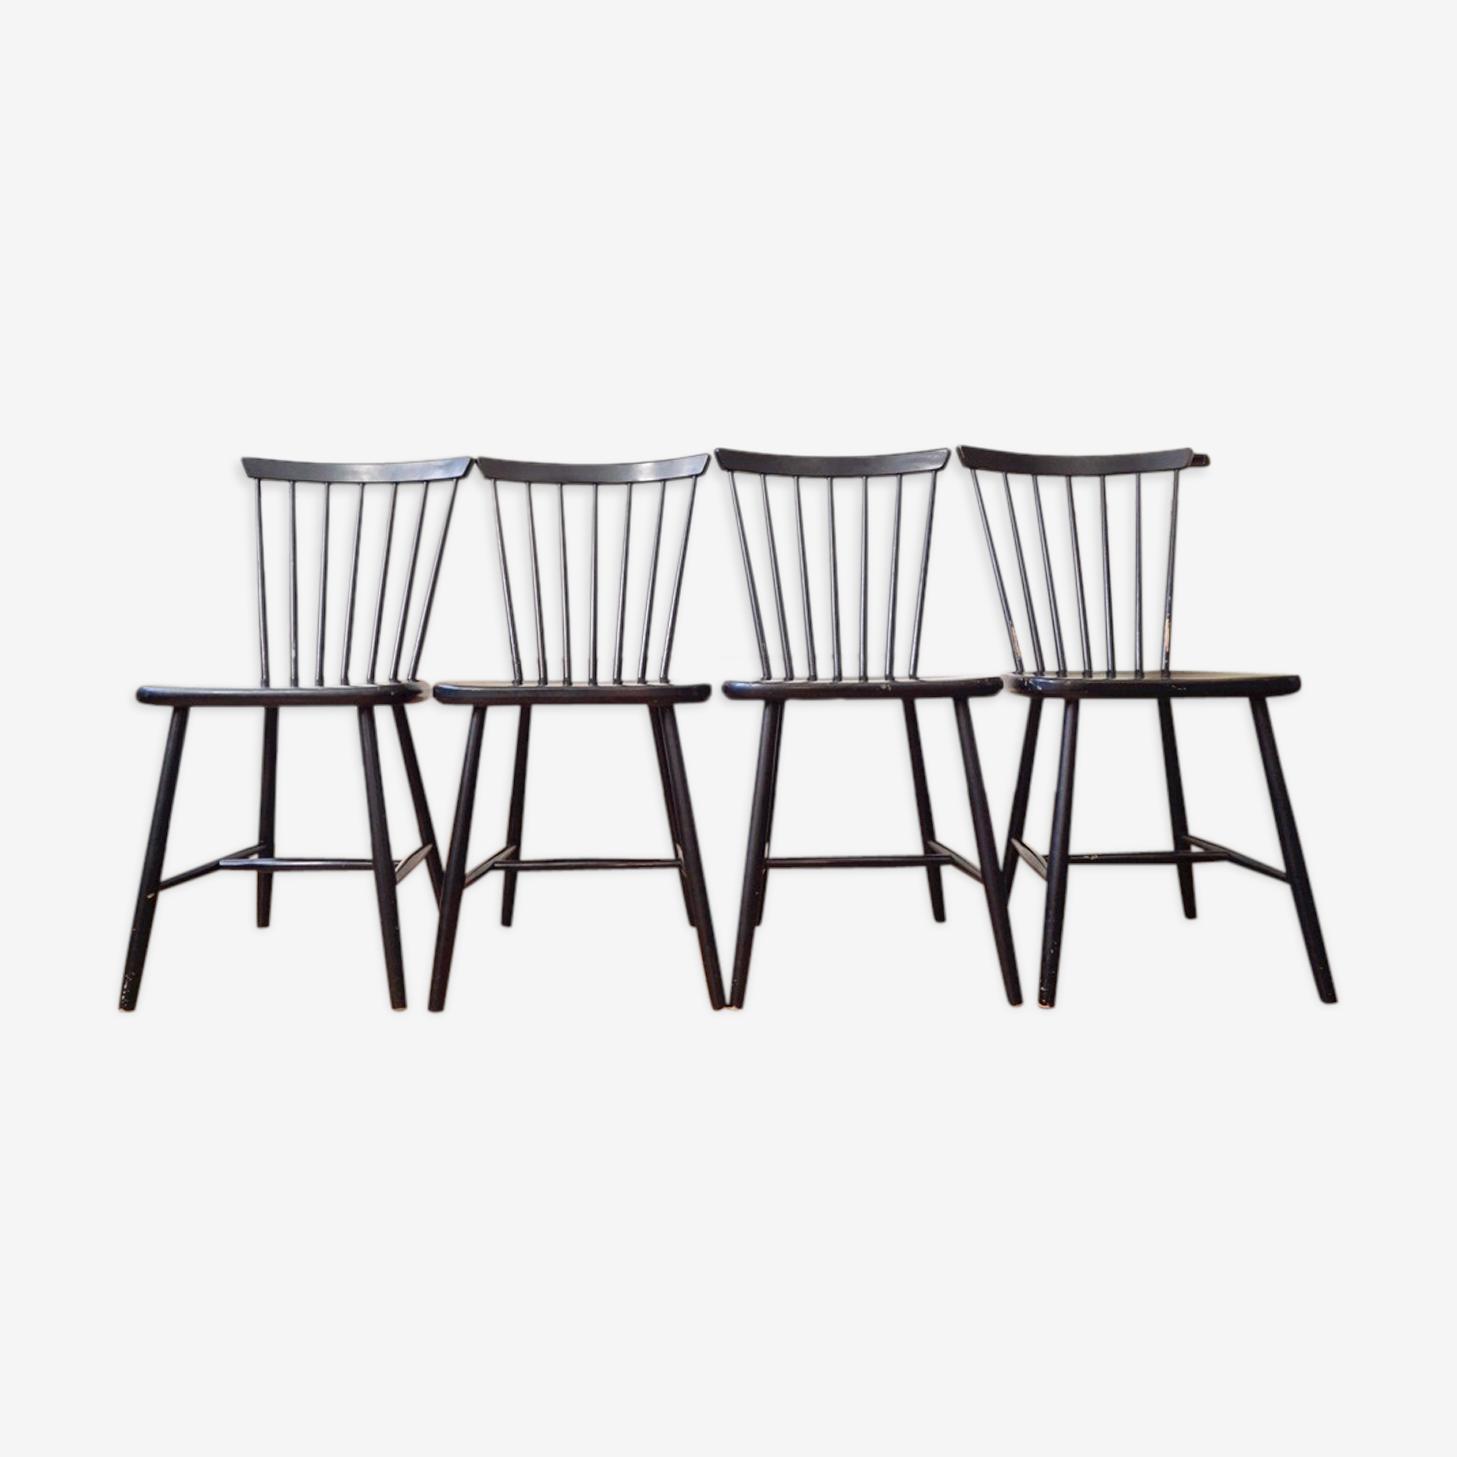 Série 4 chaises made in Sweden by Edsby Verken